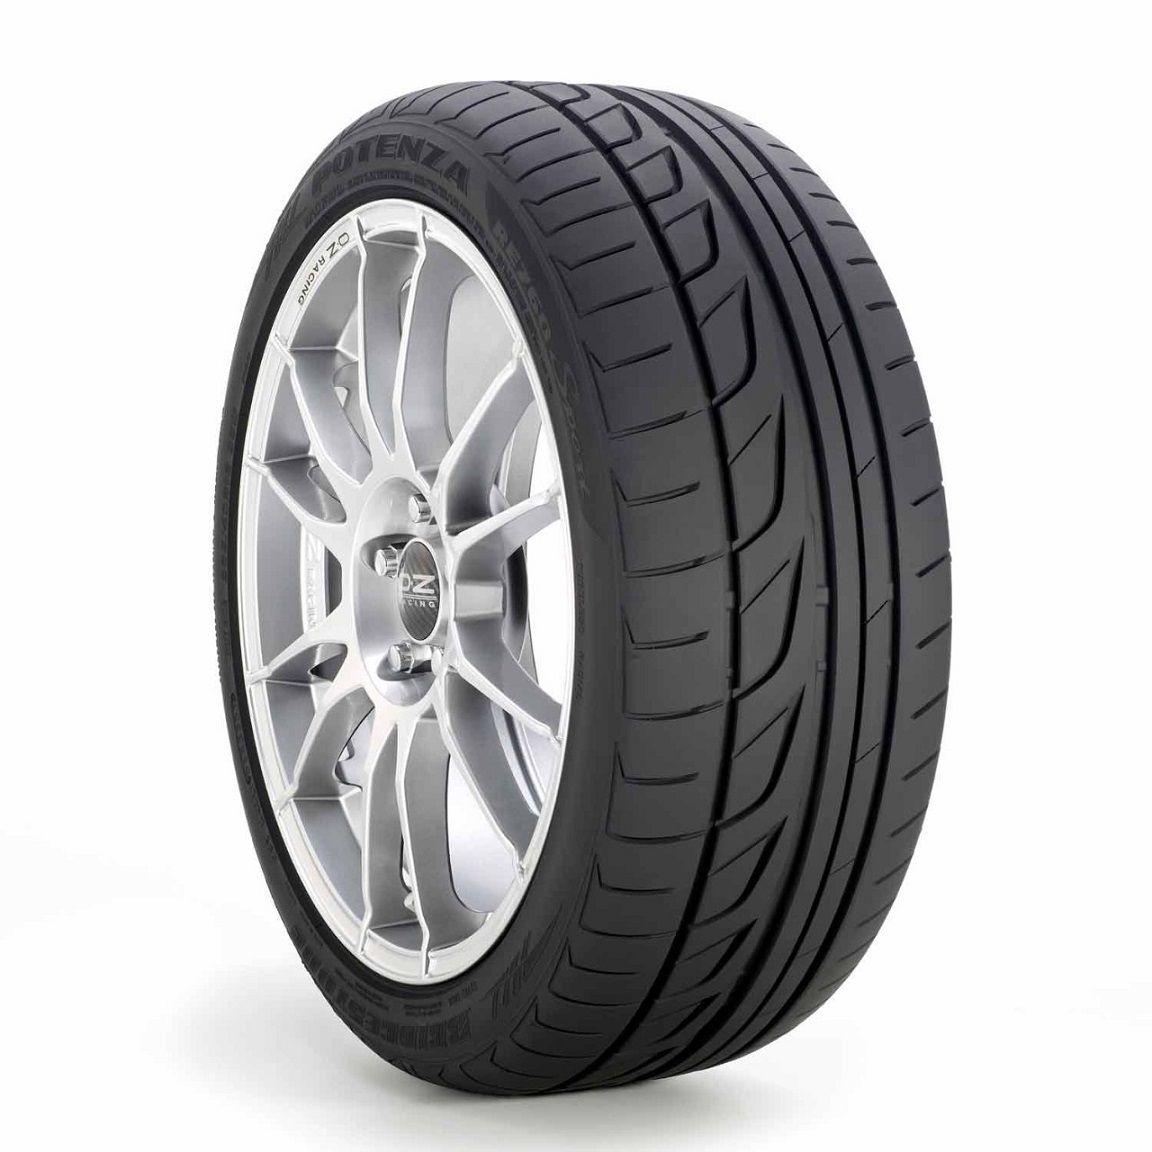 Pneu 215/45 R 17 - Potenza Re760 Sport 91w - Bridgestone